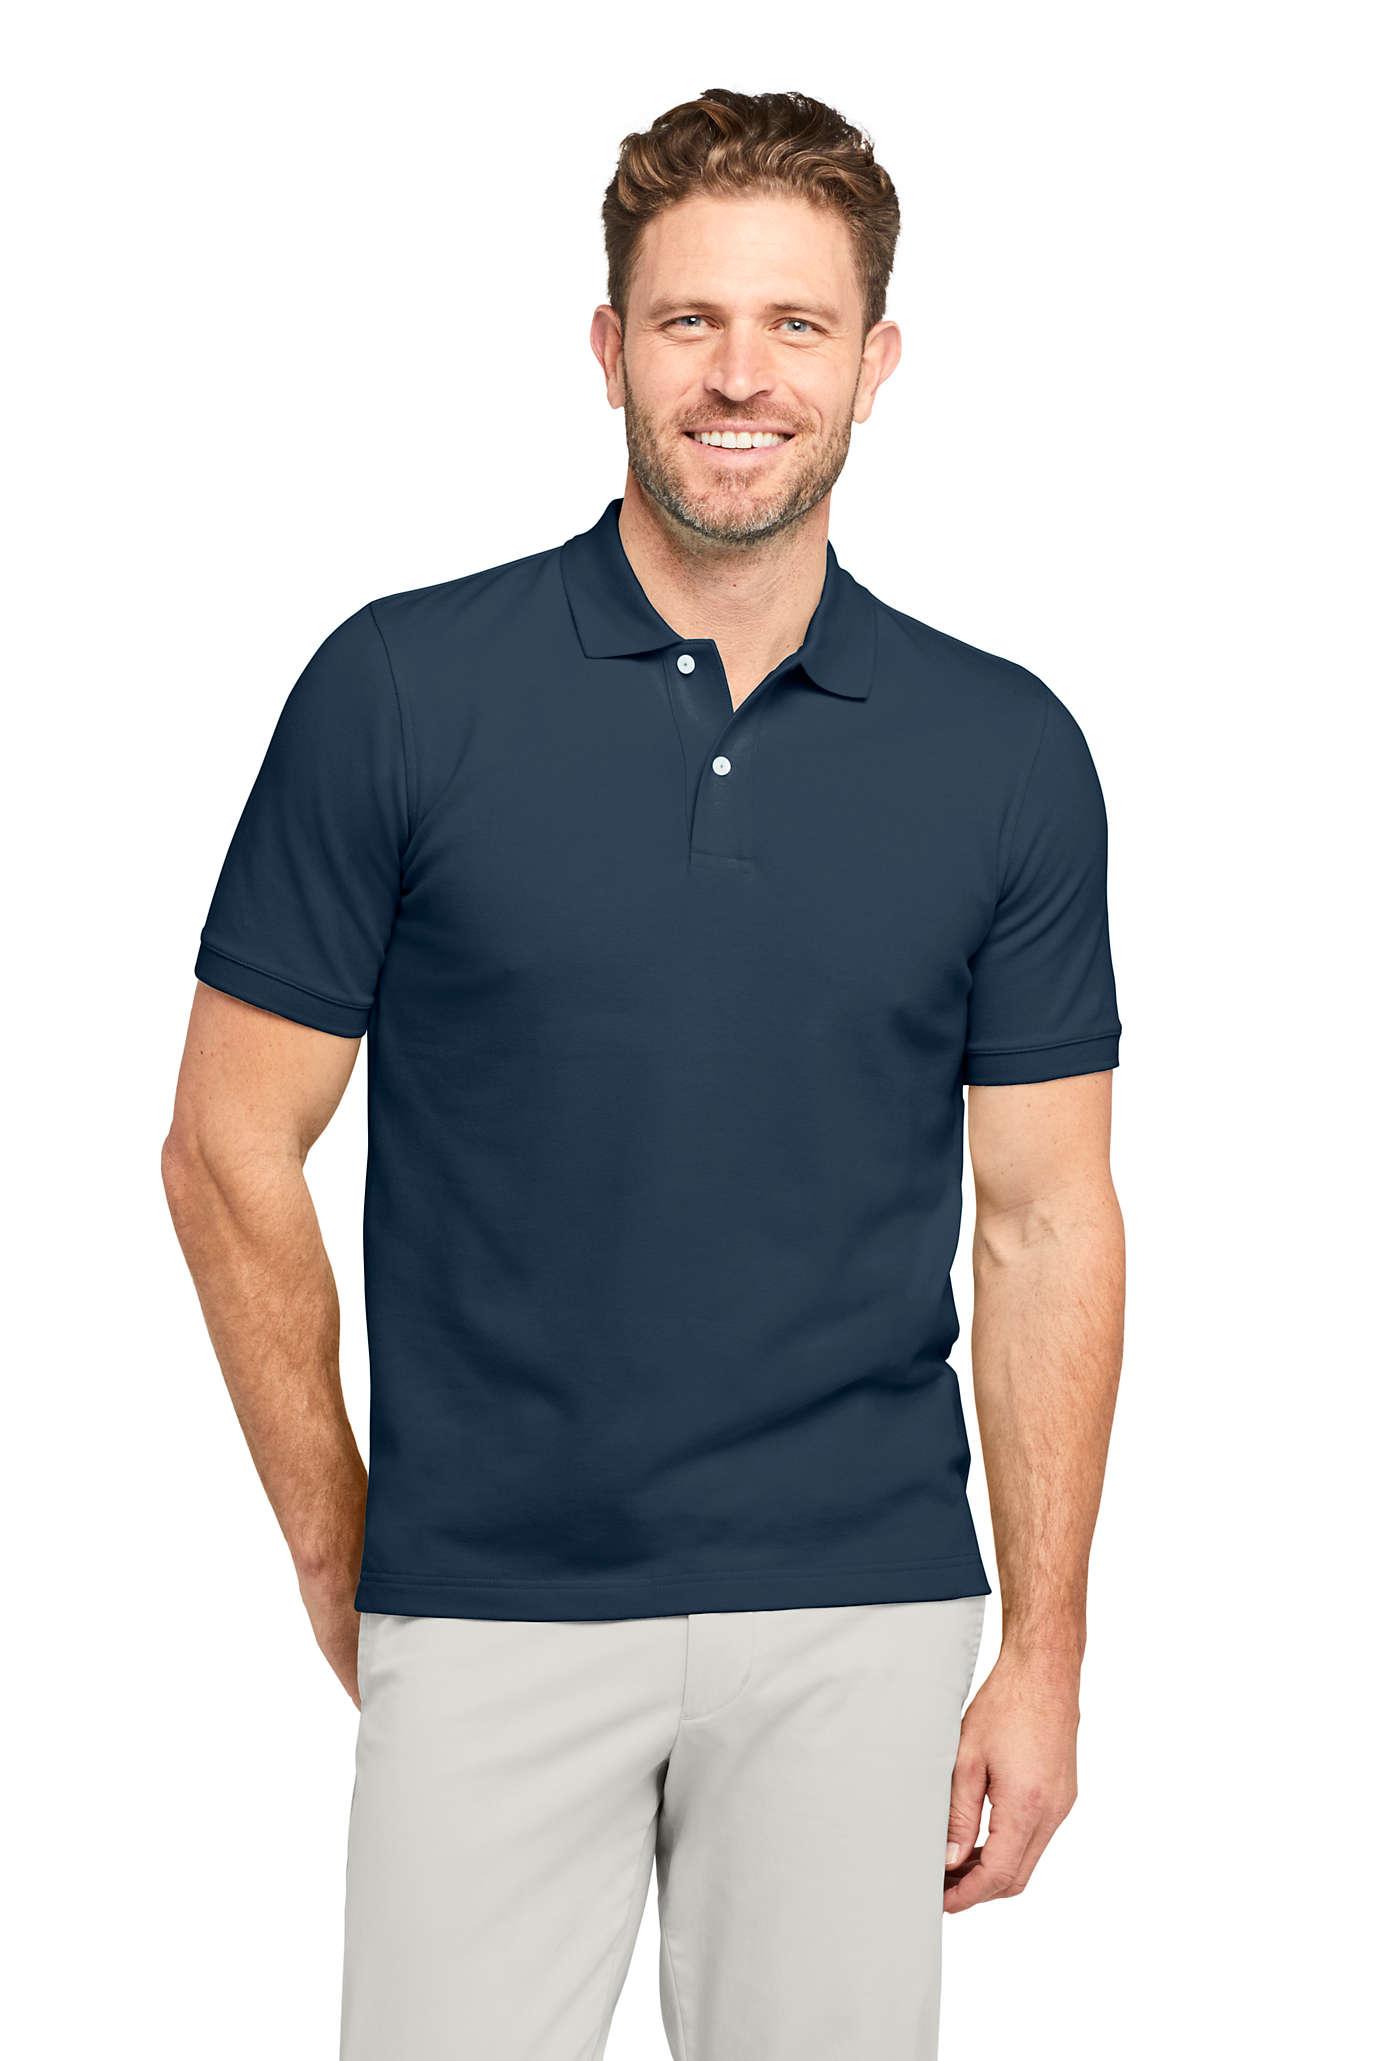 Men's Short Sleeve Mesh Polo